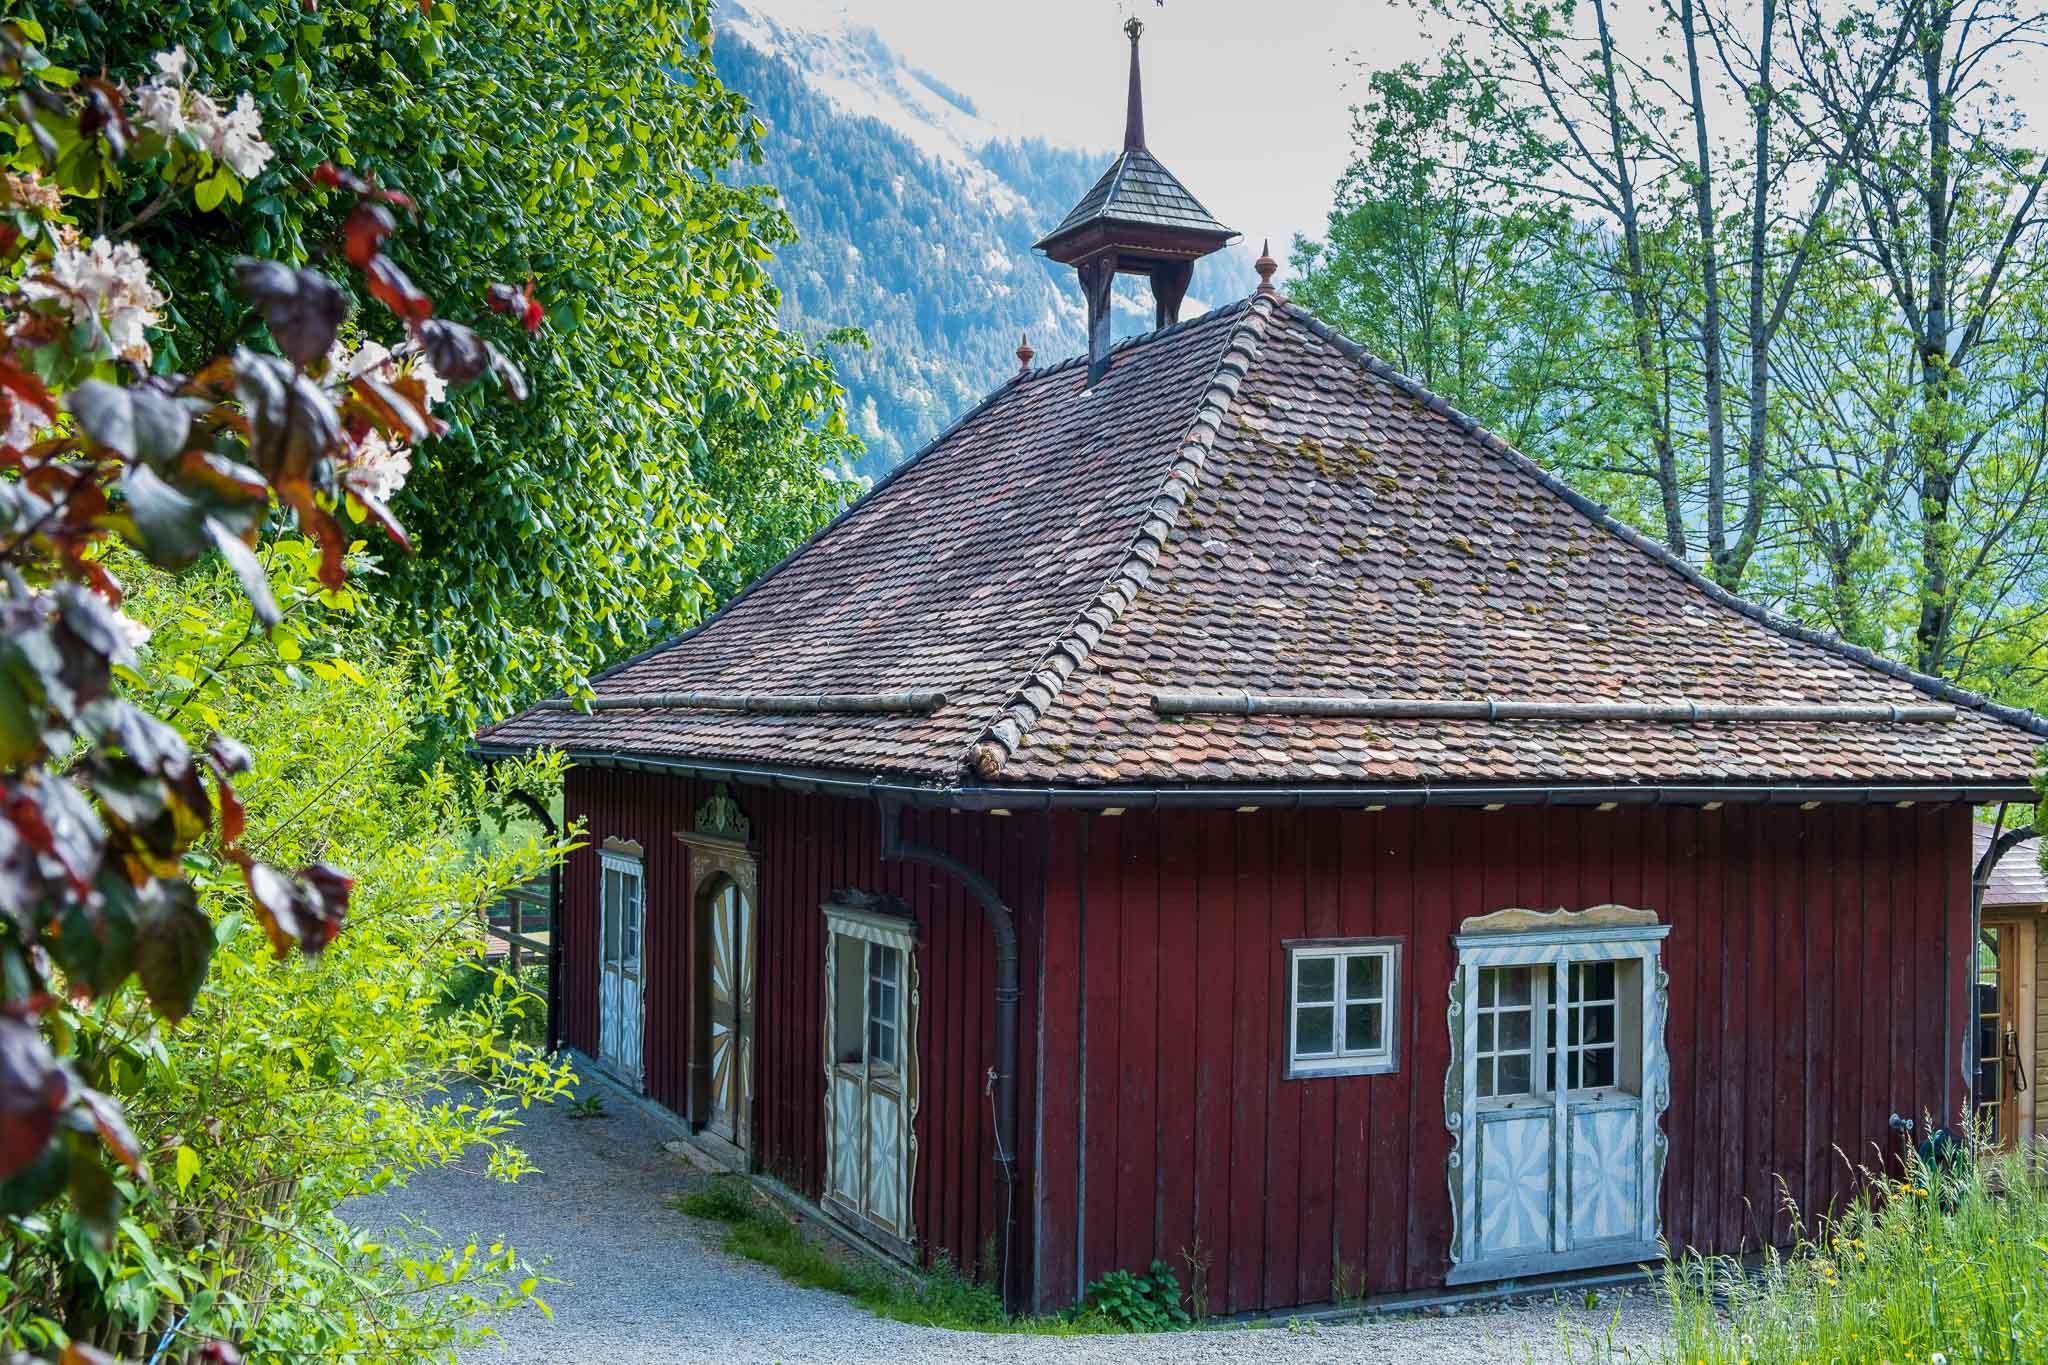 The Stables on Rossinière audio tour Cowbells, Chalets and Balthus: A Swiss Alpine Village Excursion